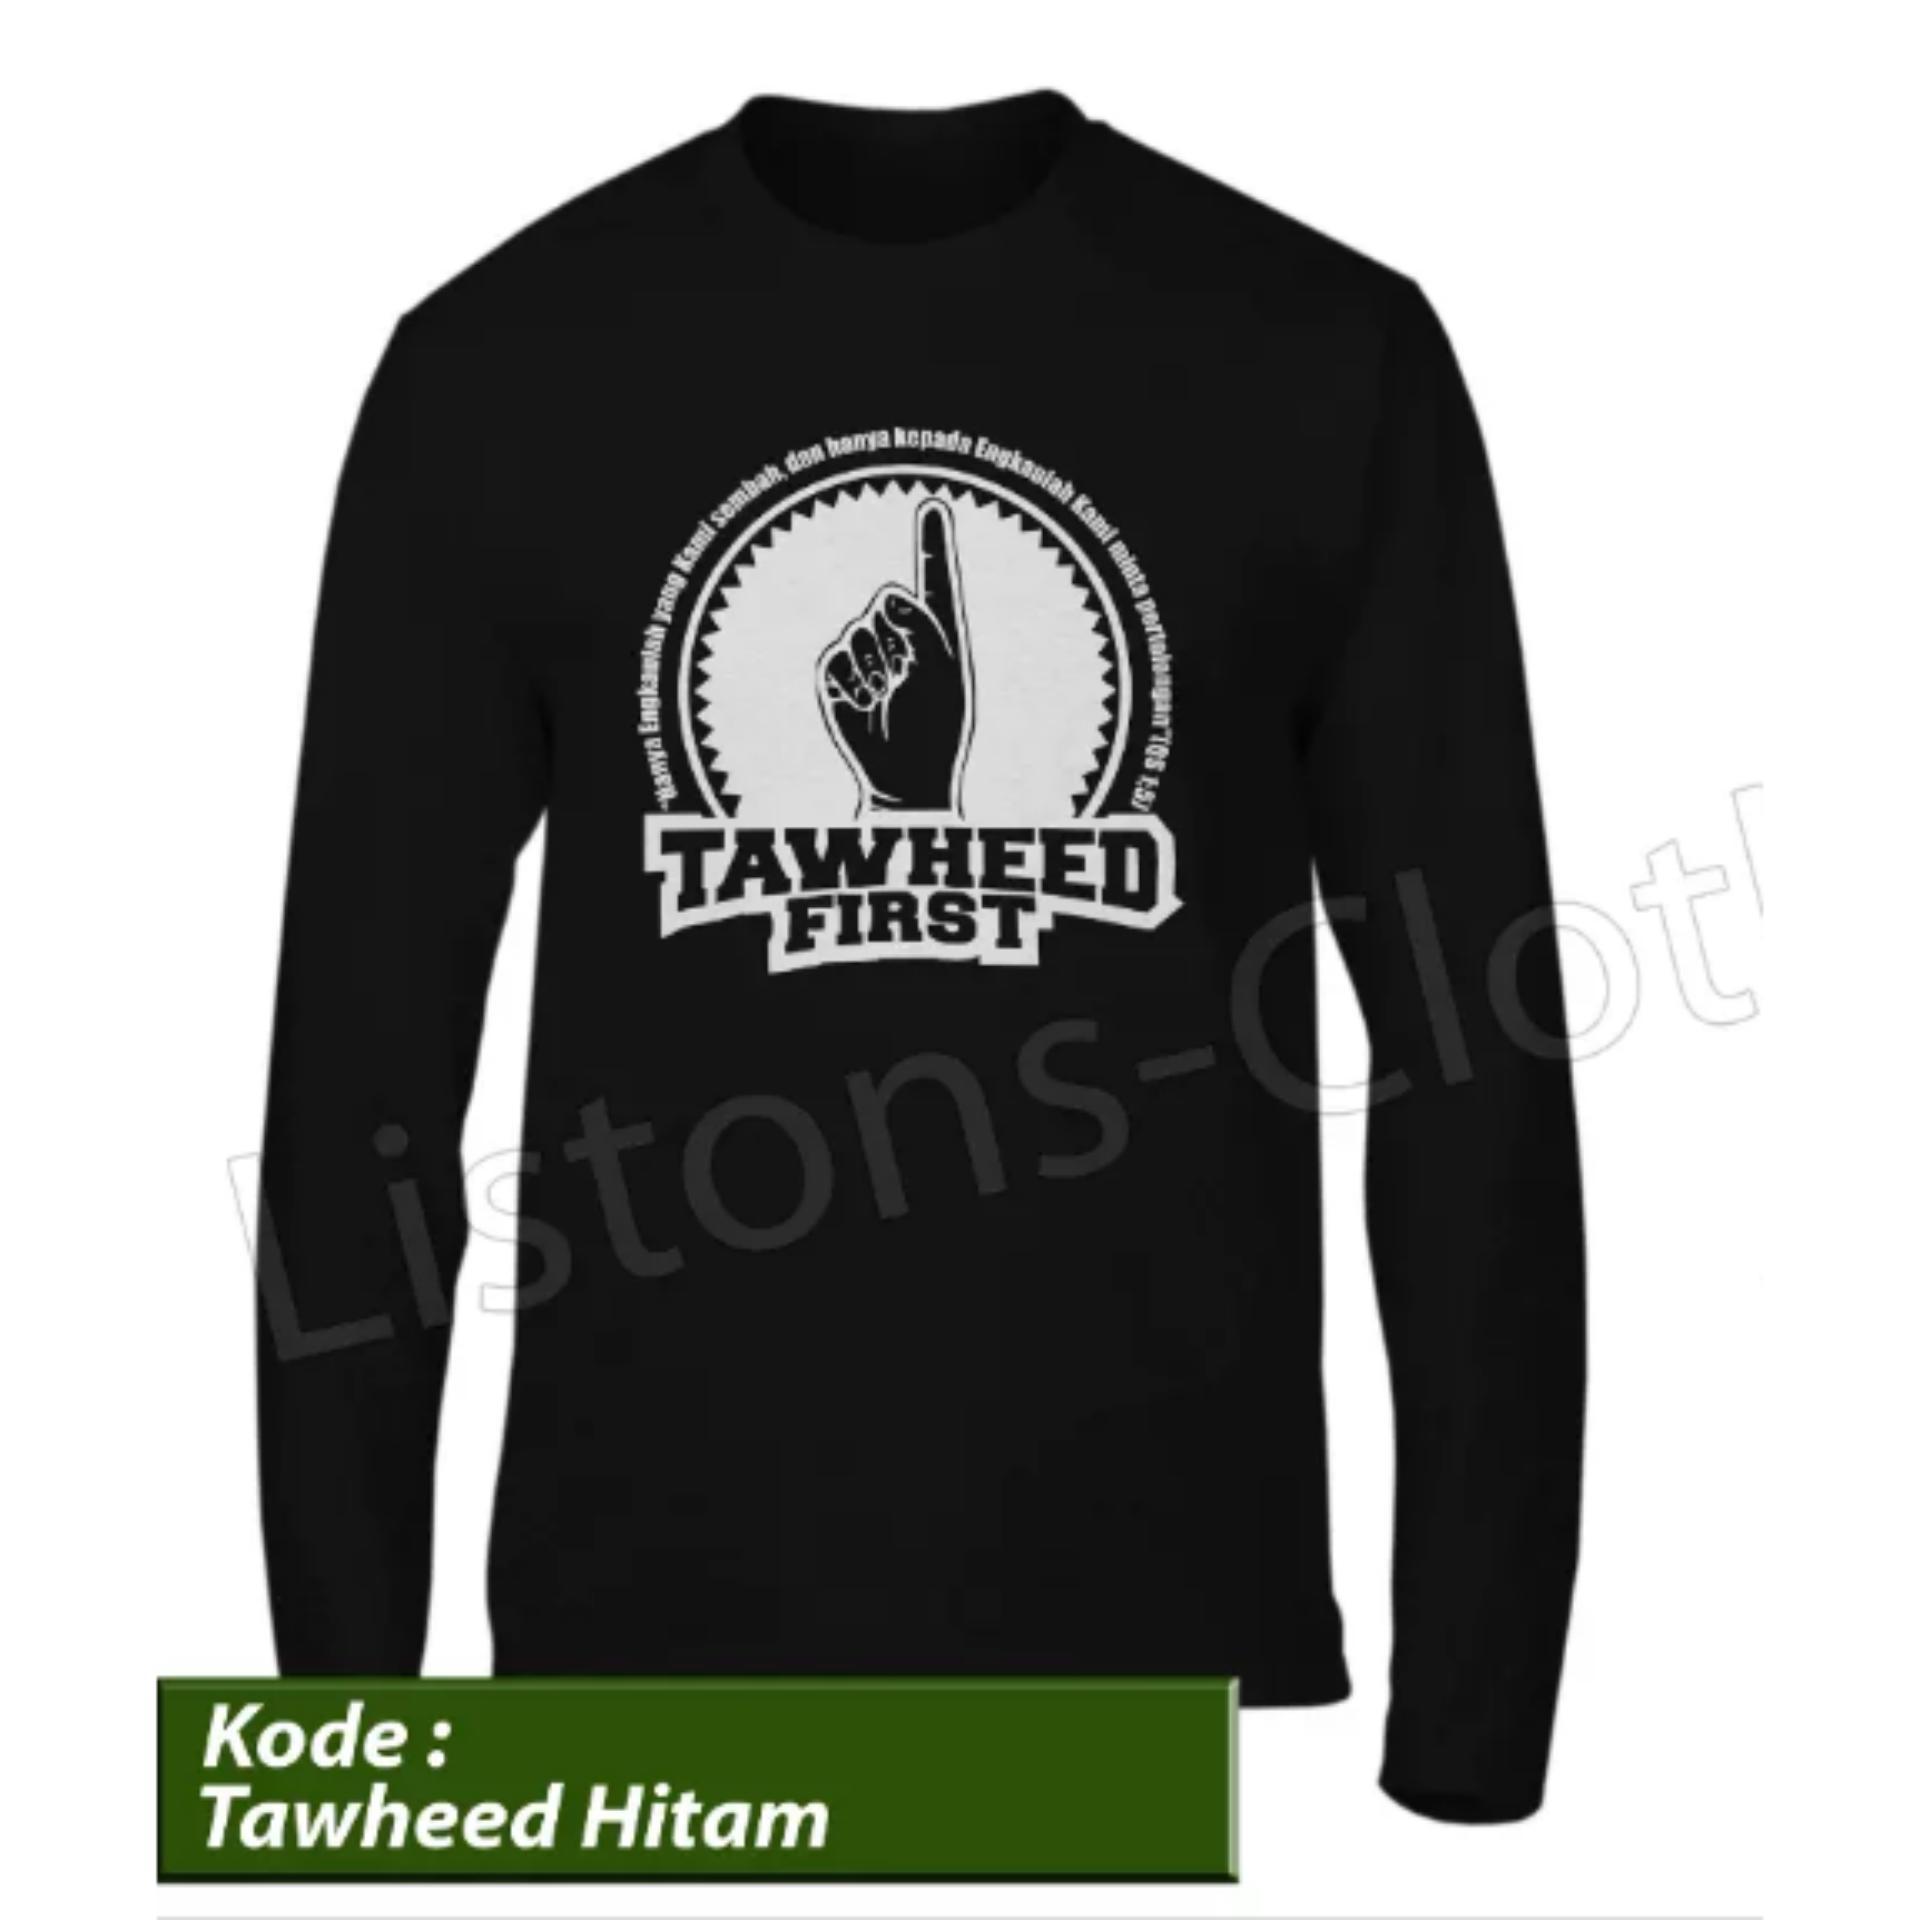 Kaos Distro Islami Tawheed First Tauhid Hitam Lengan Panjang Baju Muslim Tshirt Rohani Islam